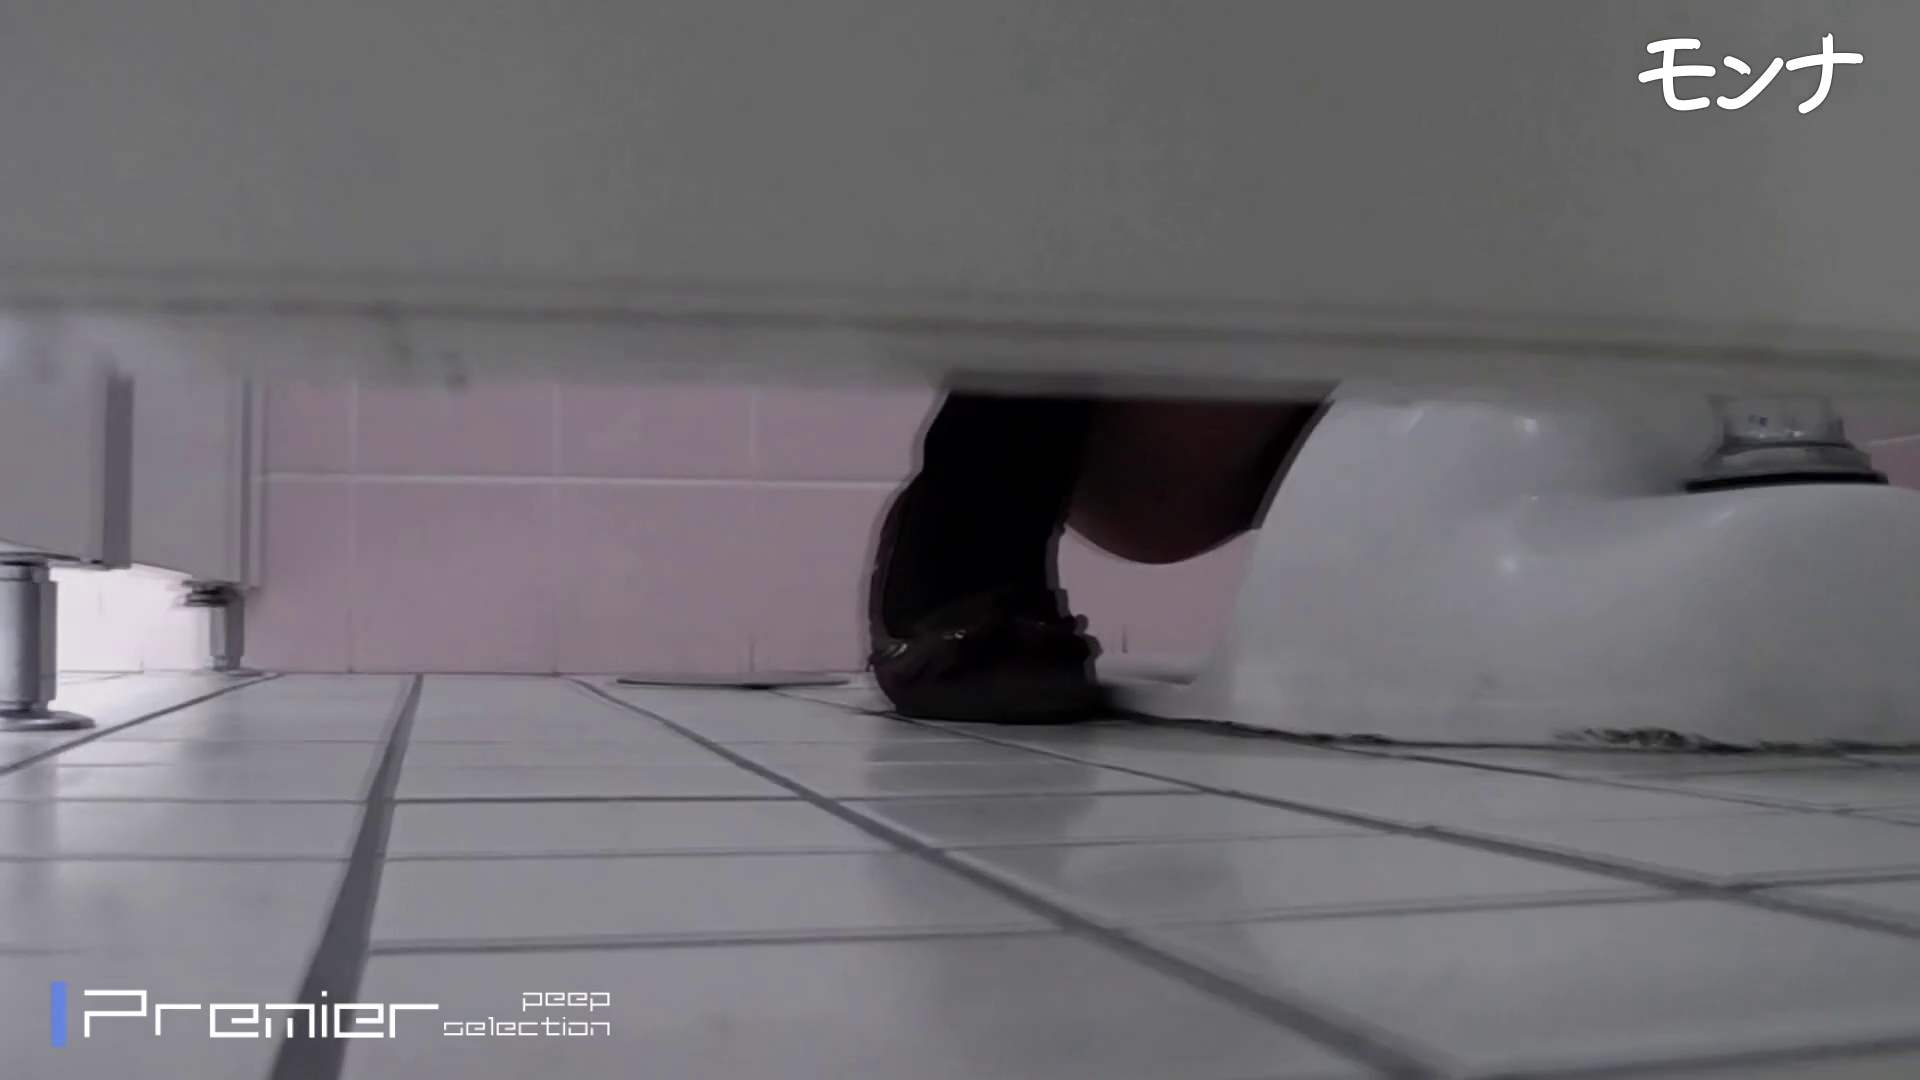 CM 悶絶シリーズ5 【美しい日本の未来 No.128】 お姉さんのSEX オマンコ無修正動画無料 111枚 14